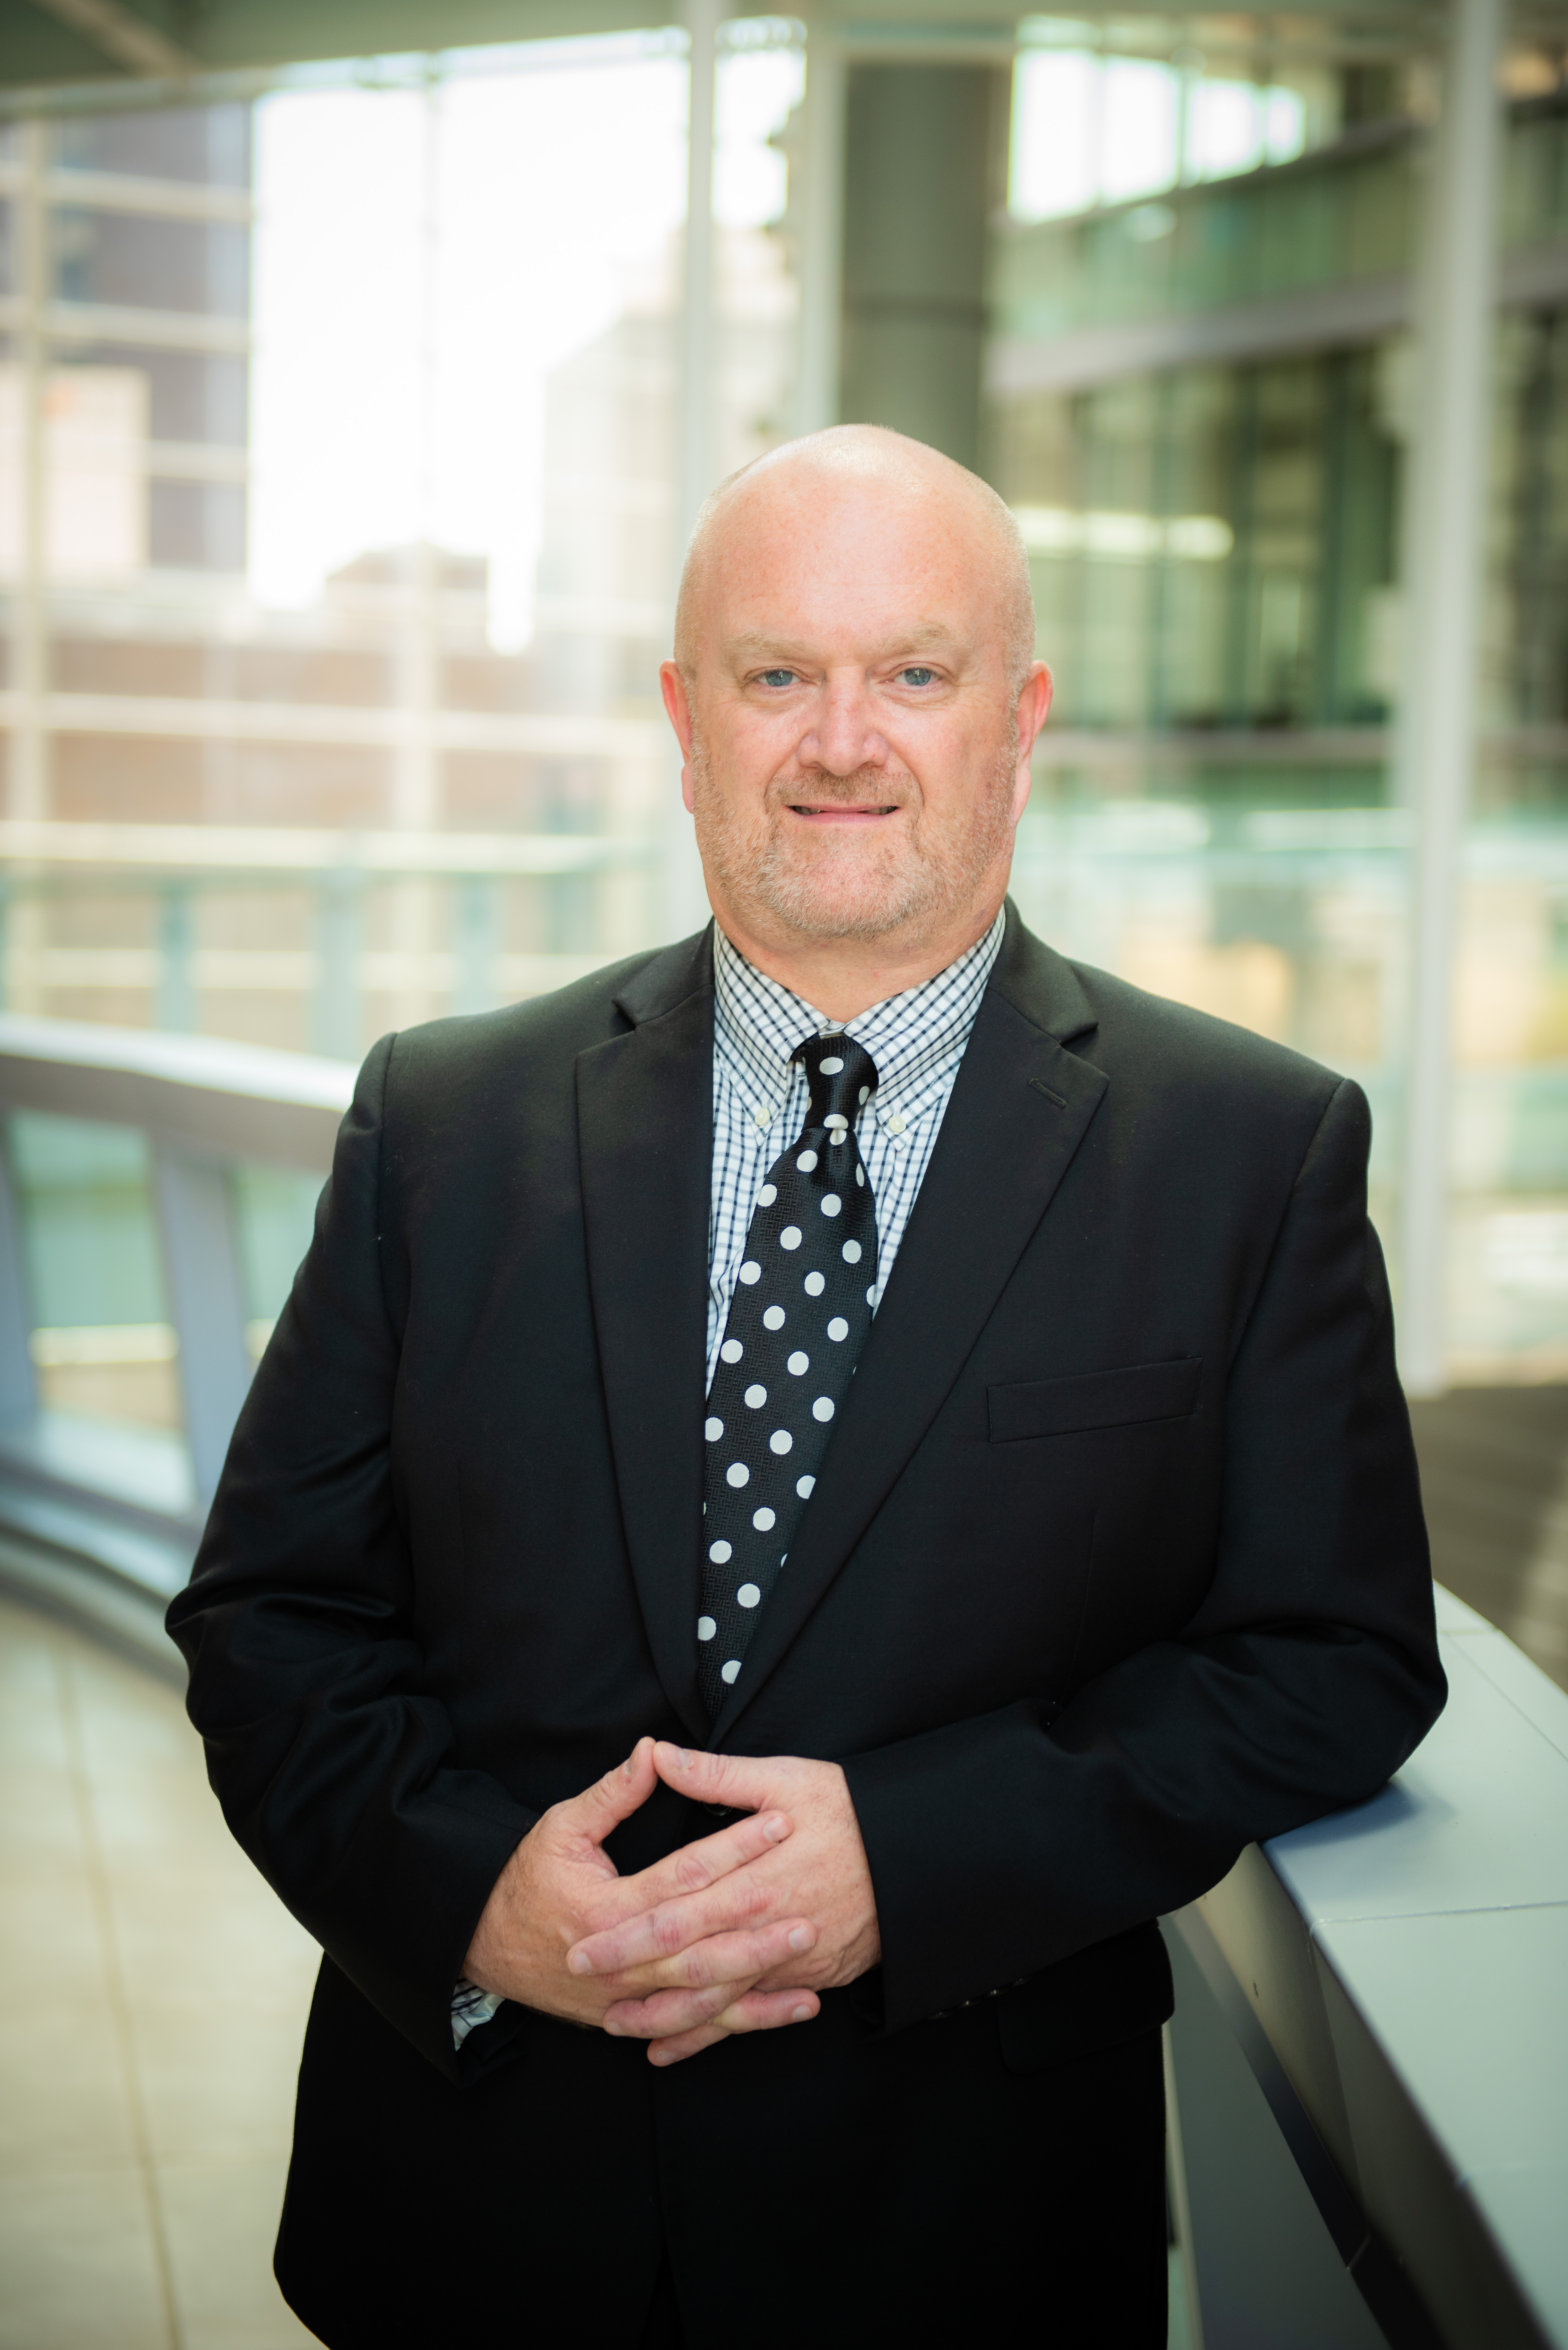 Insightful conversation with Bob Feldbauer on future of Health Facilities